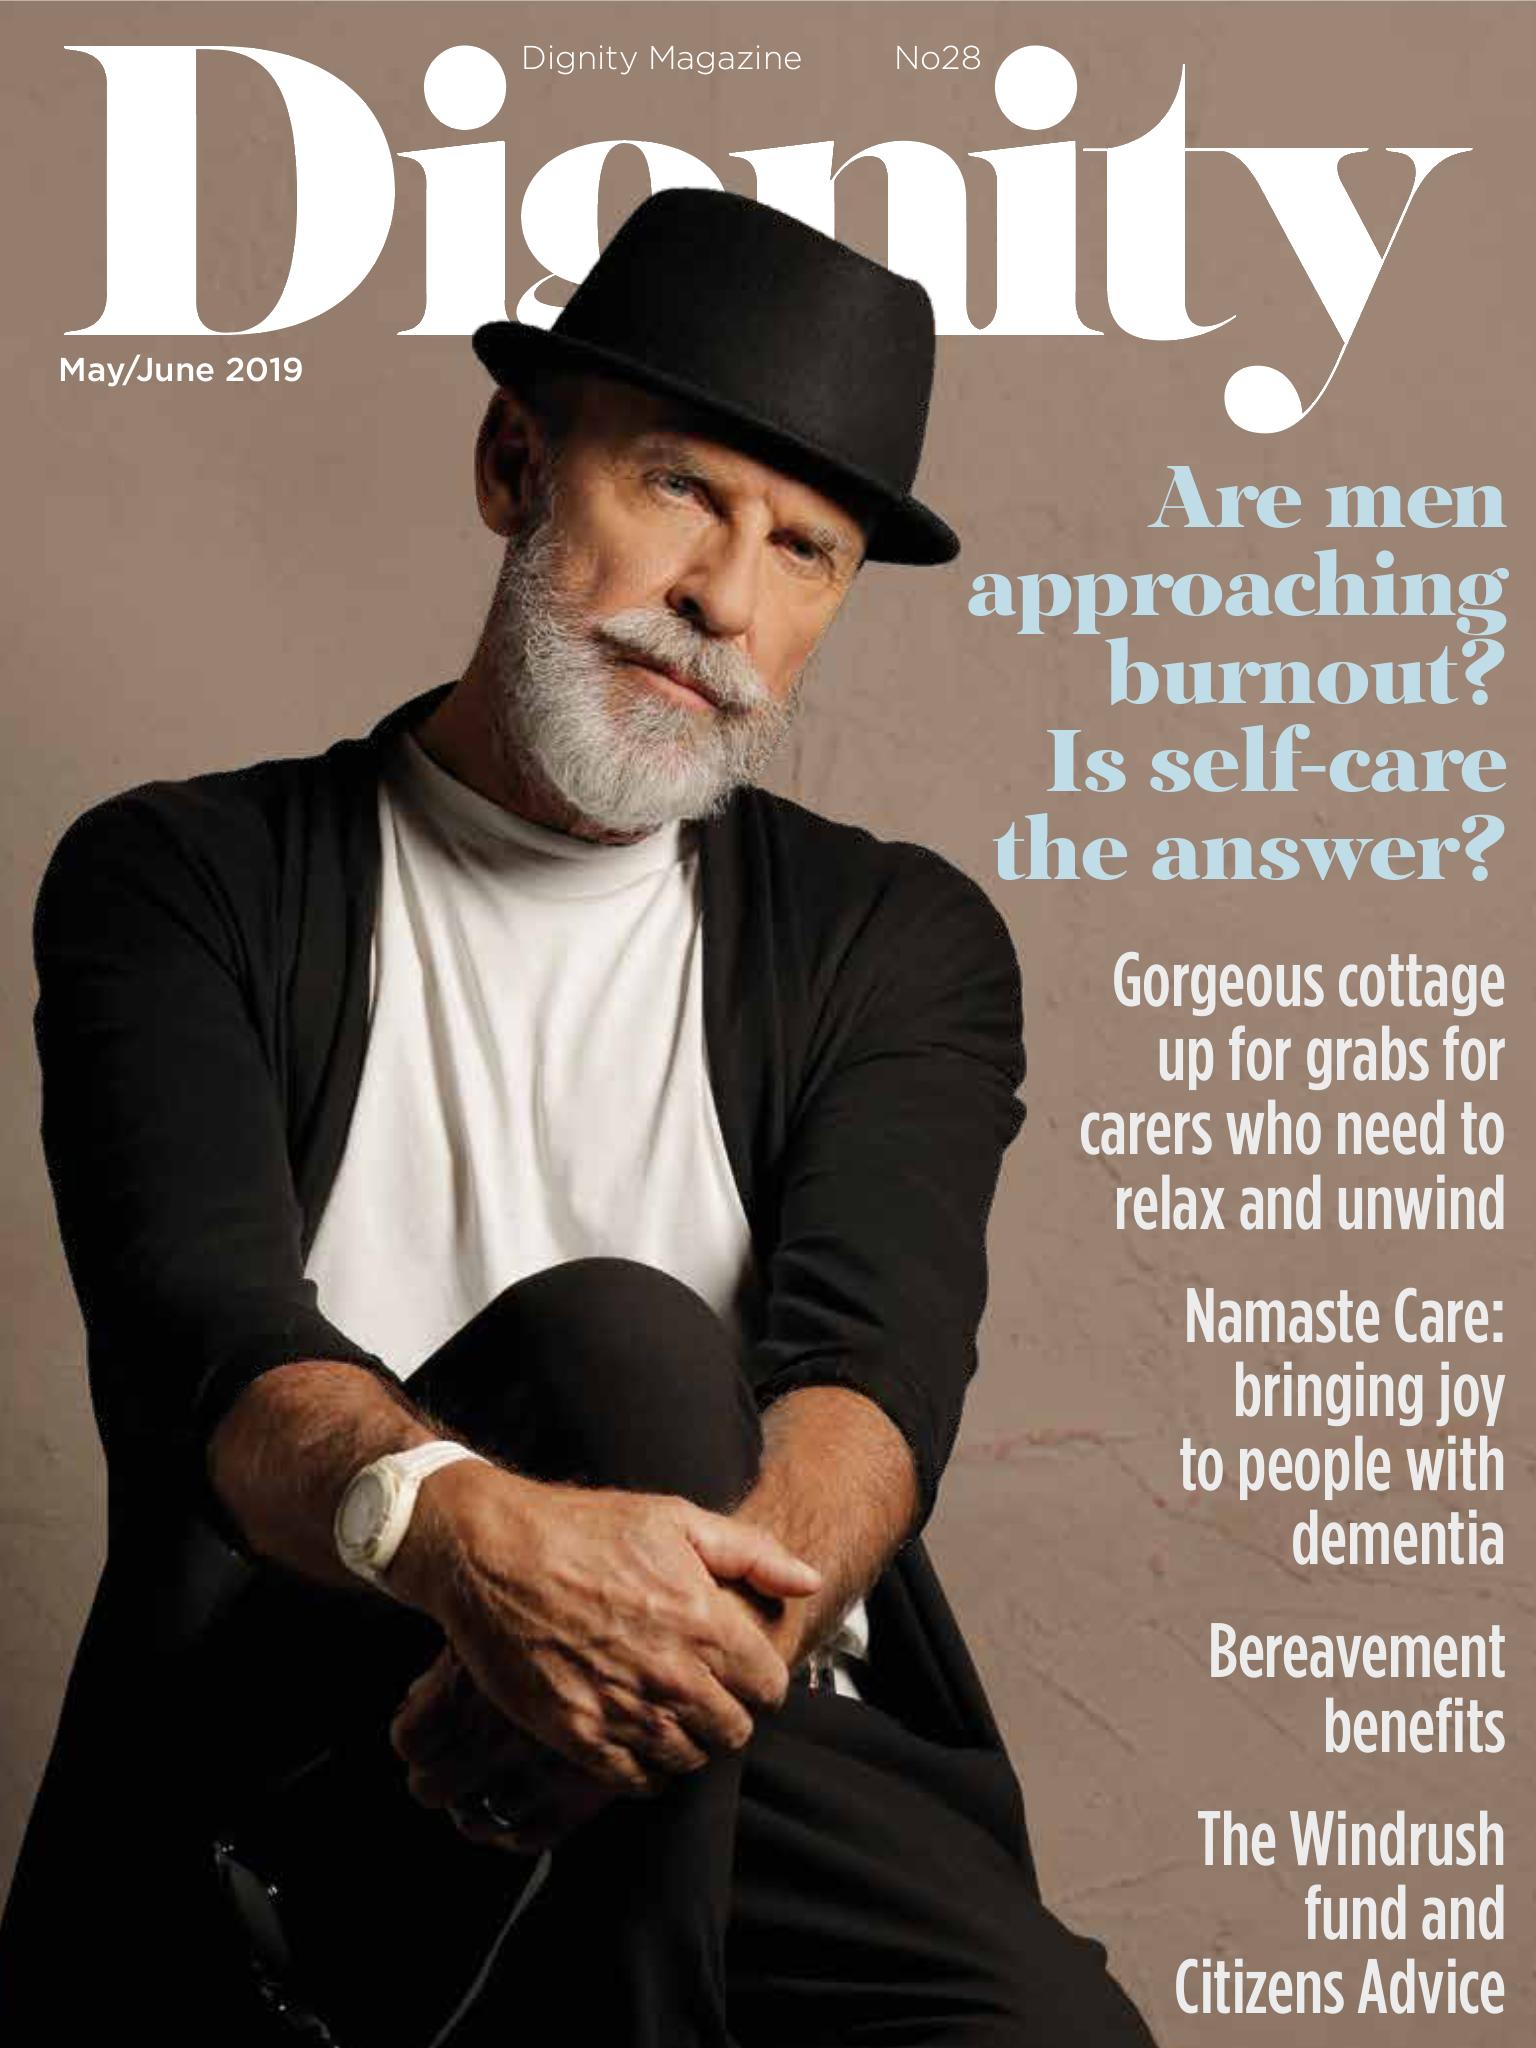 Men's health :: Dignity Magazine